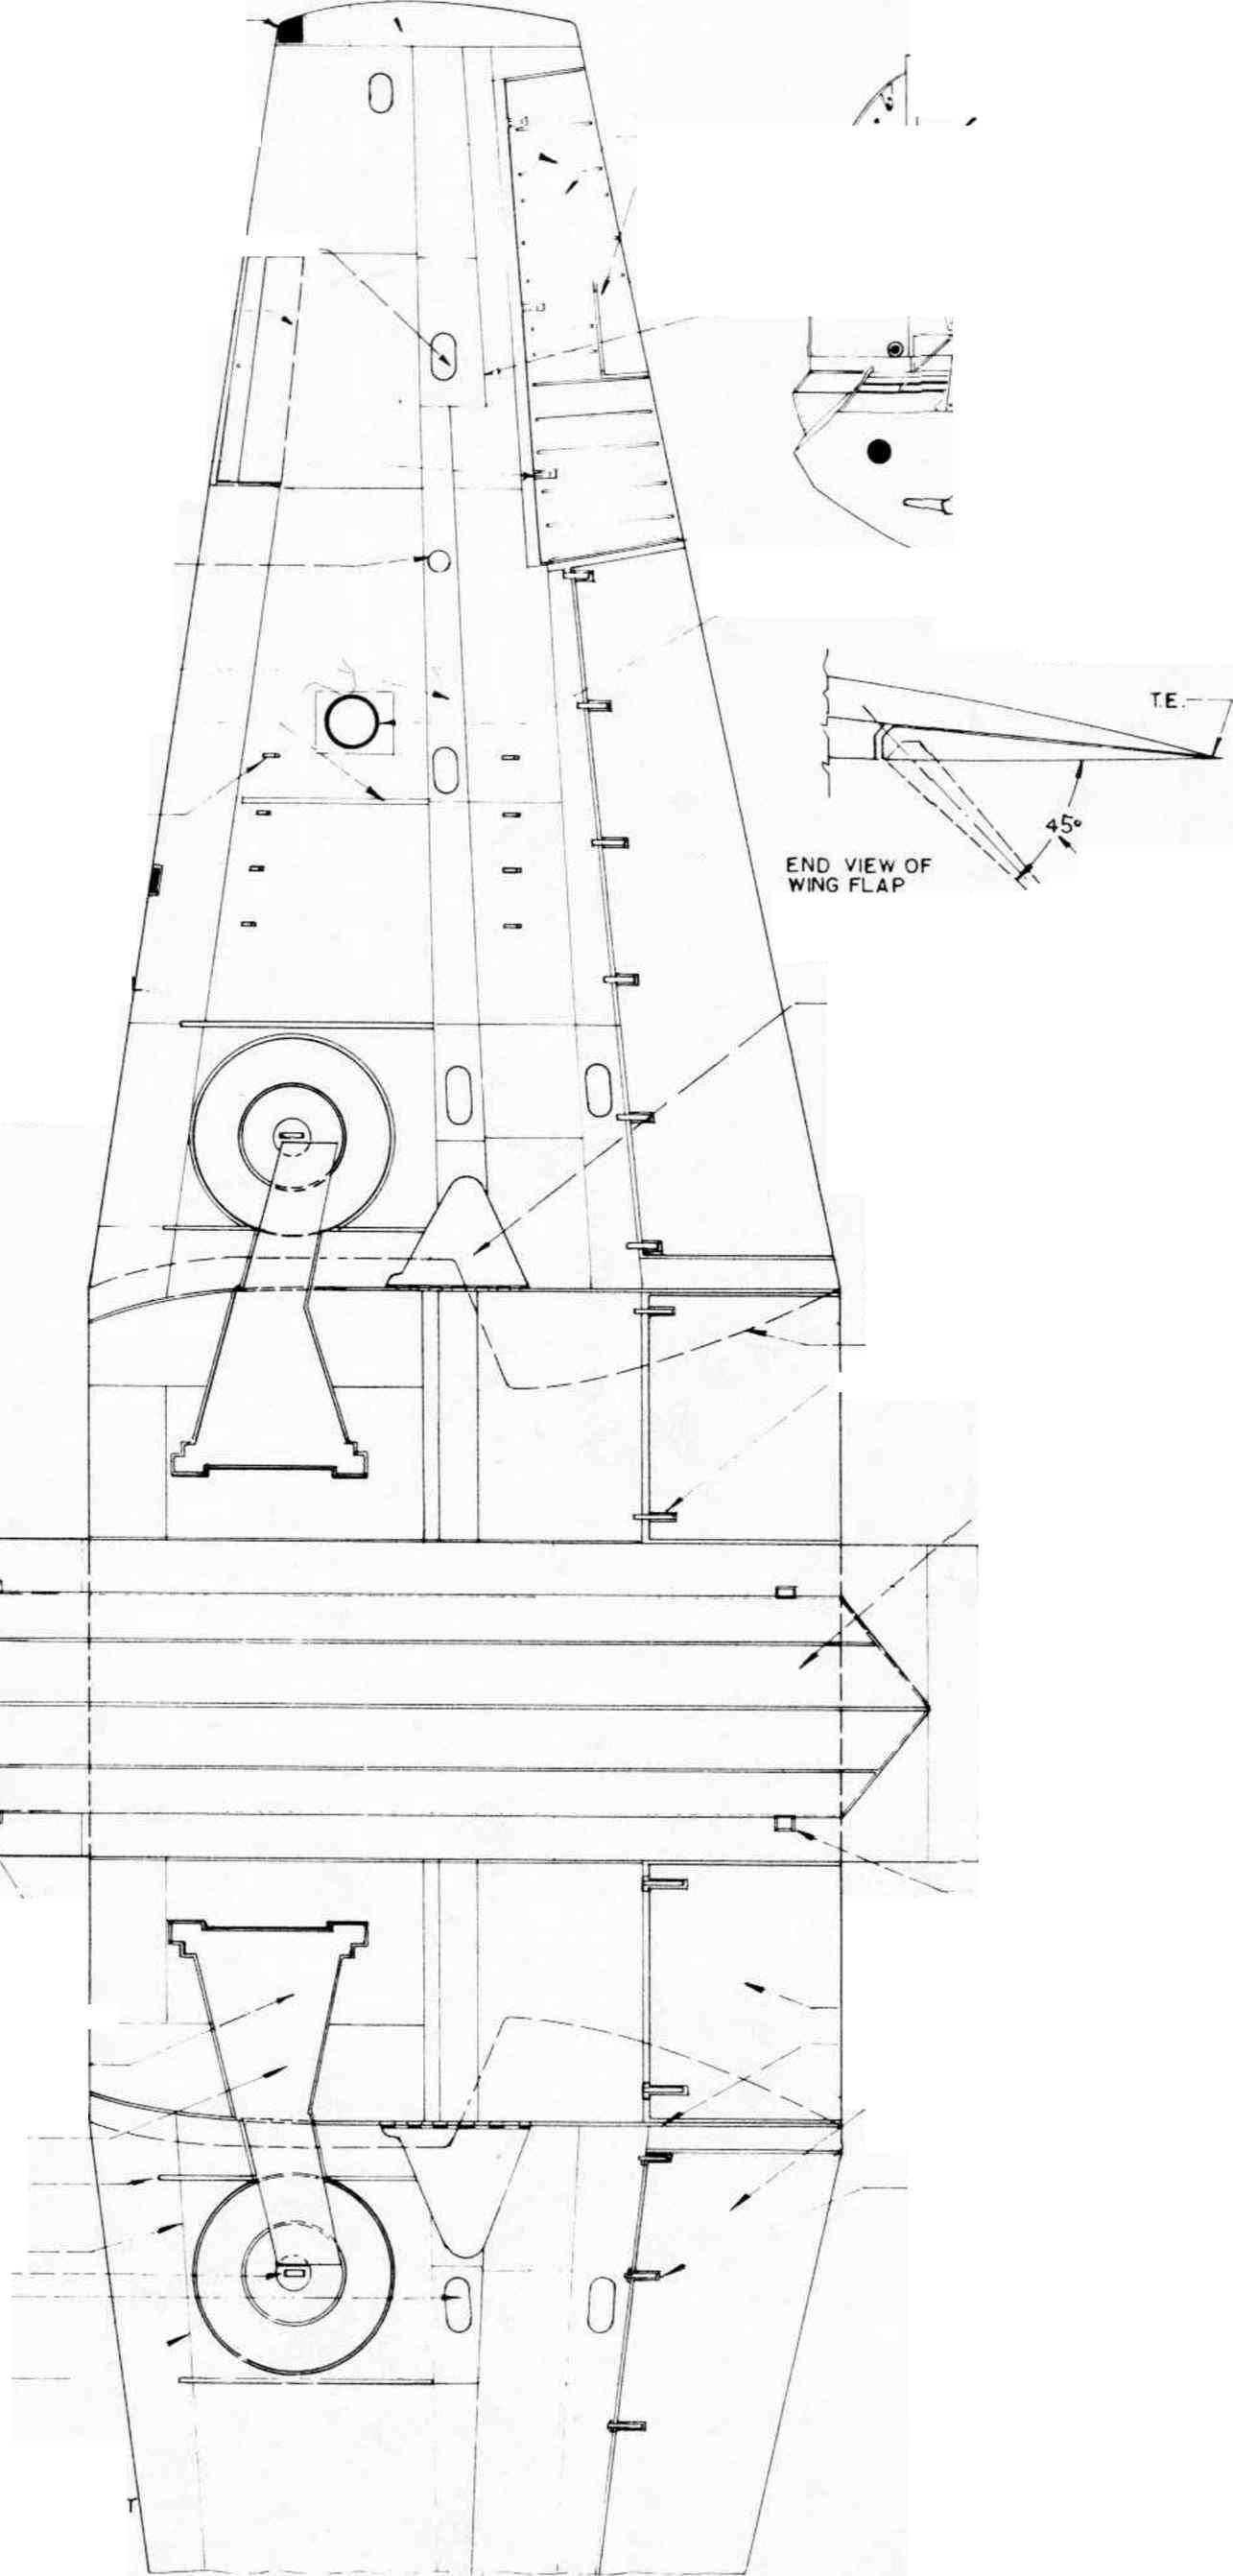 Coil Wiring Diagram 2003 Pontiac Aztek. Pontiac. Auto